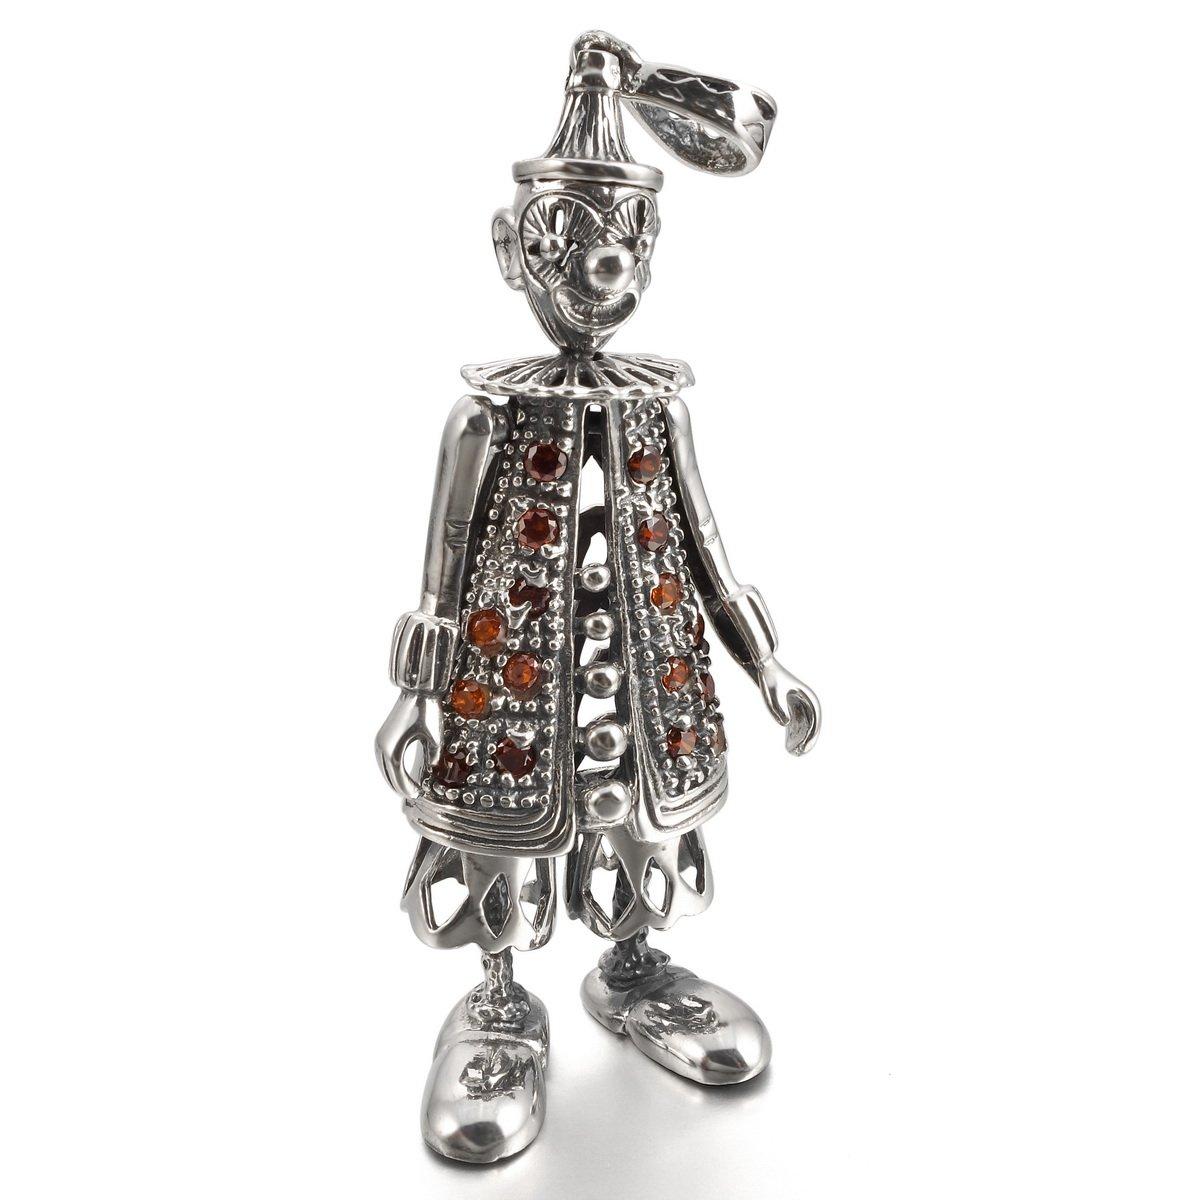 MunkiMix 925 Sterling Silver Pendant Necklace CZ Silver Clown Biker Men,23 inch Chain